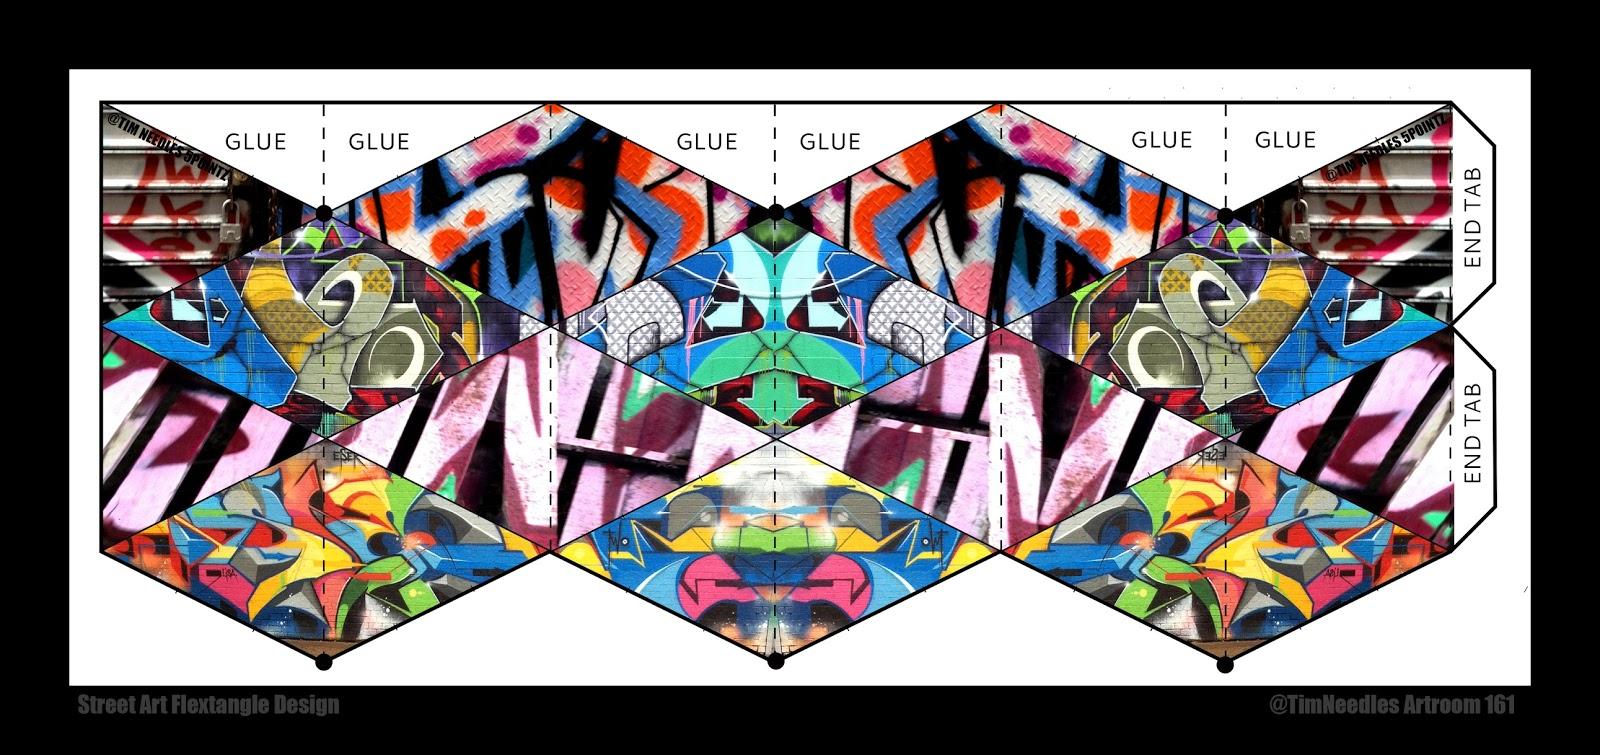 graphic regarding Flextangle Printable titled Artwork House 161: Electronic Media: Flextangles